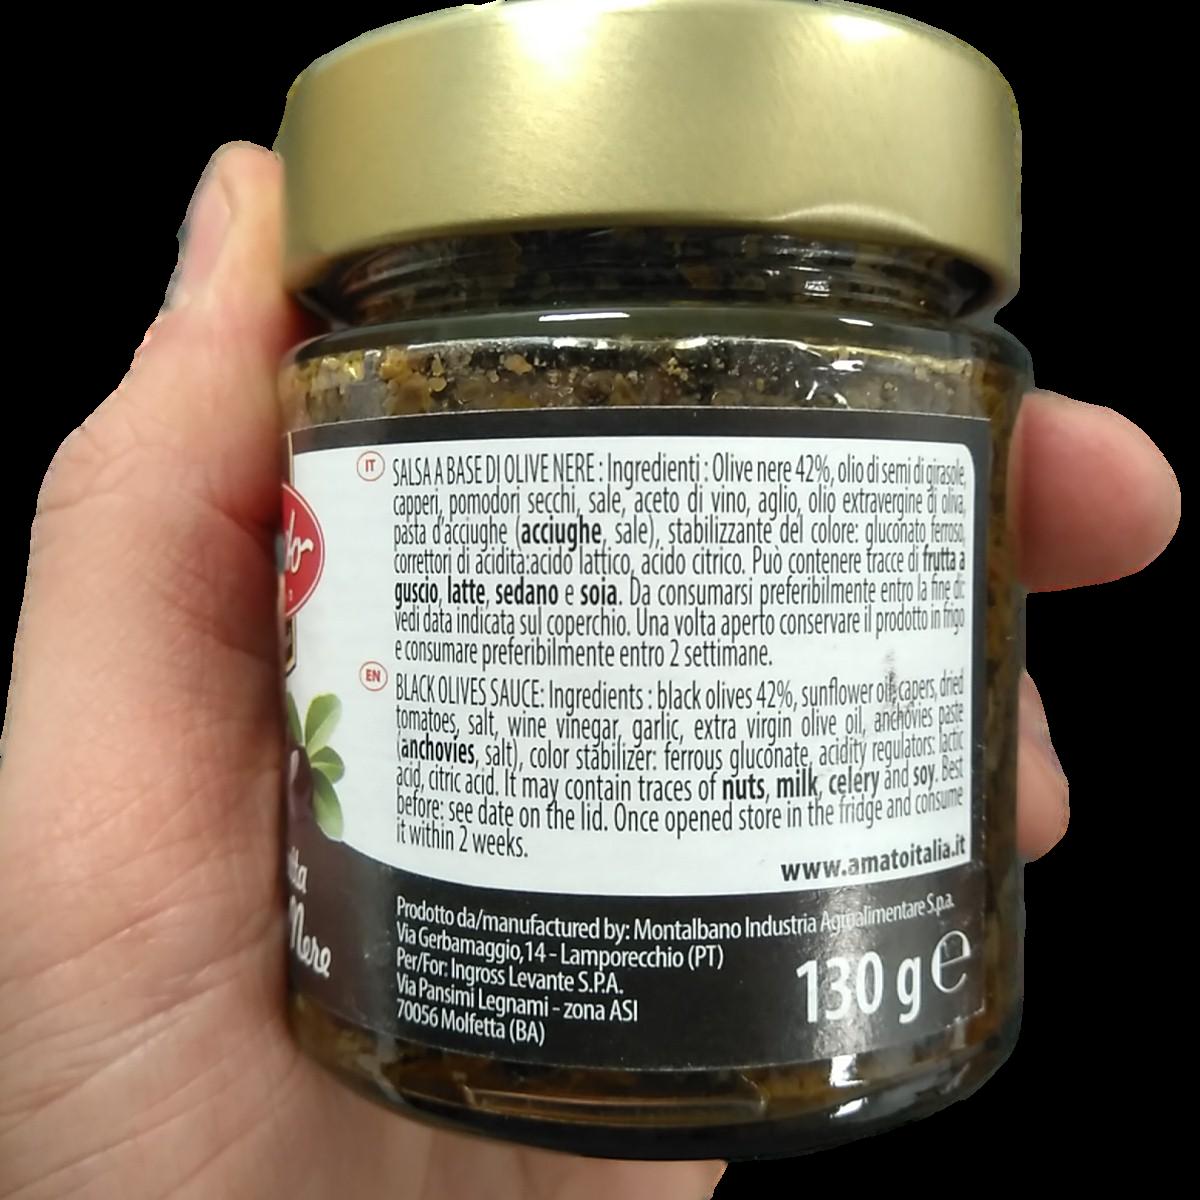 Amato 130g Bruschetta Toppings - Black Olive